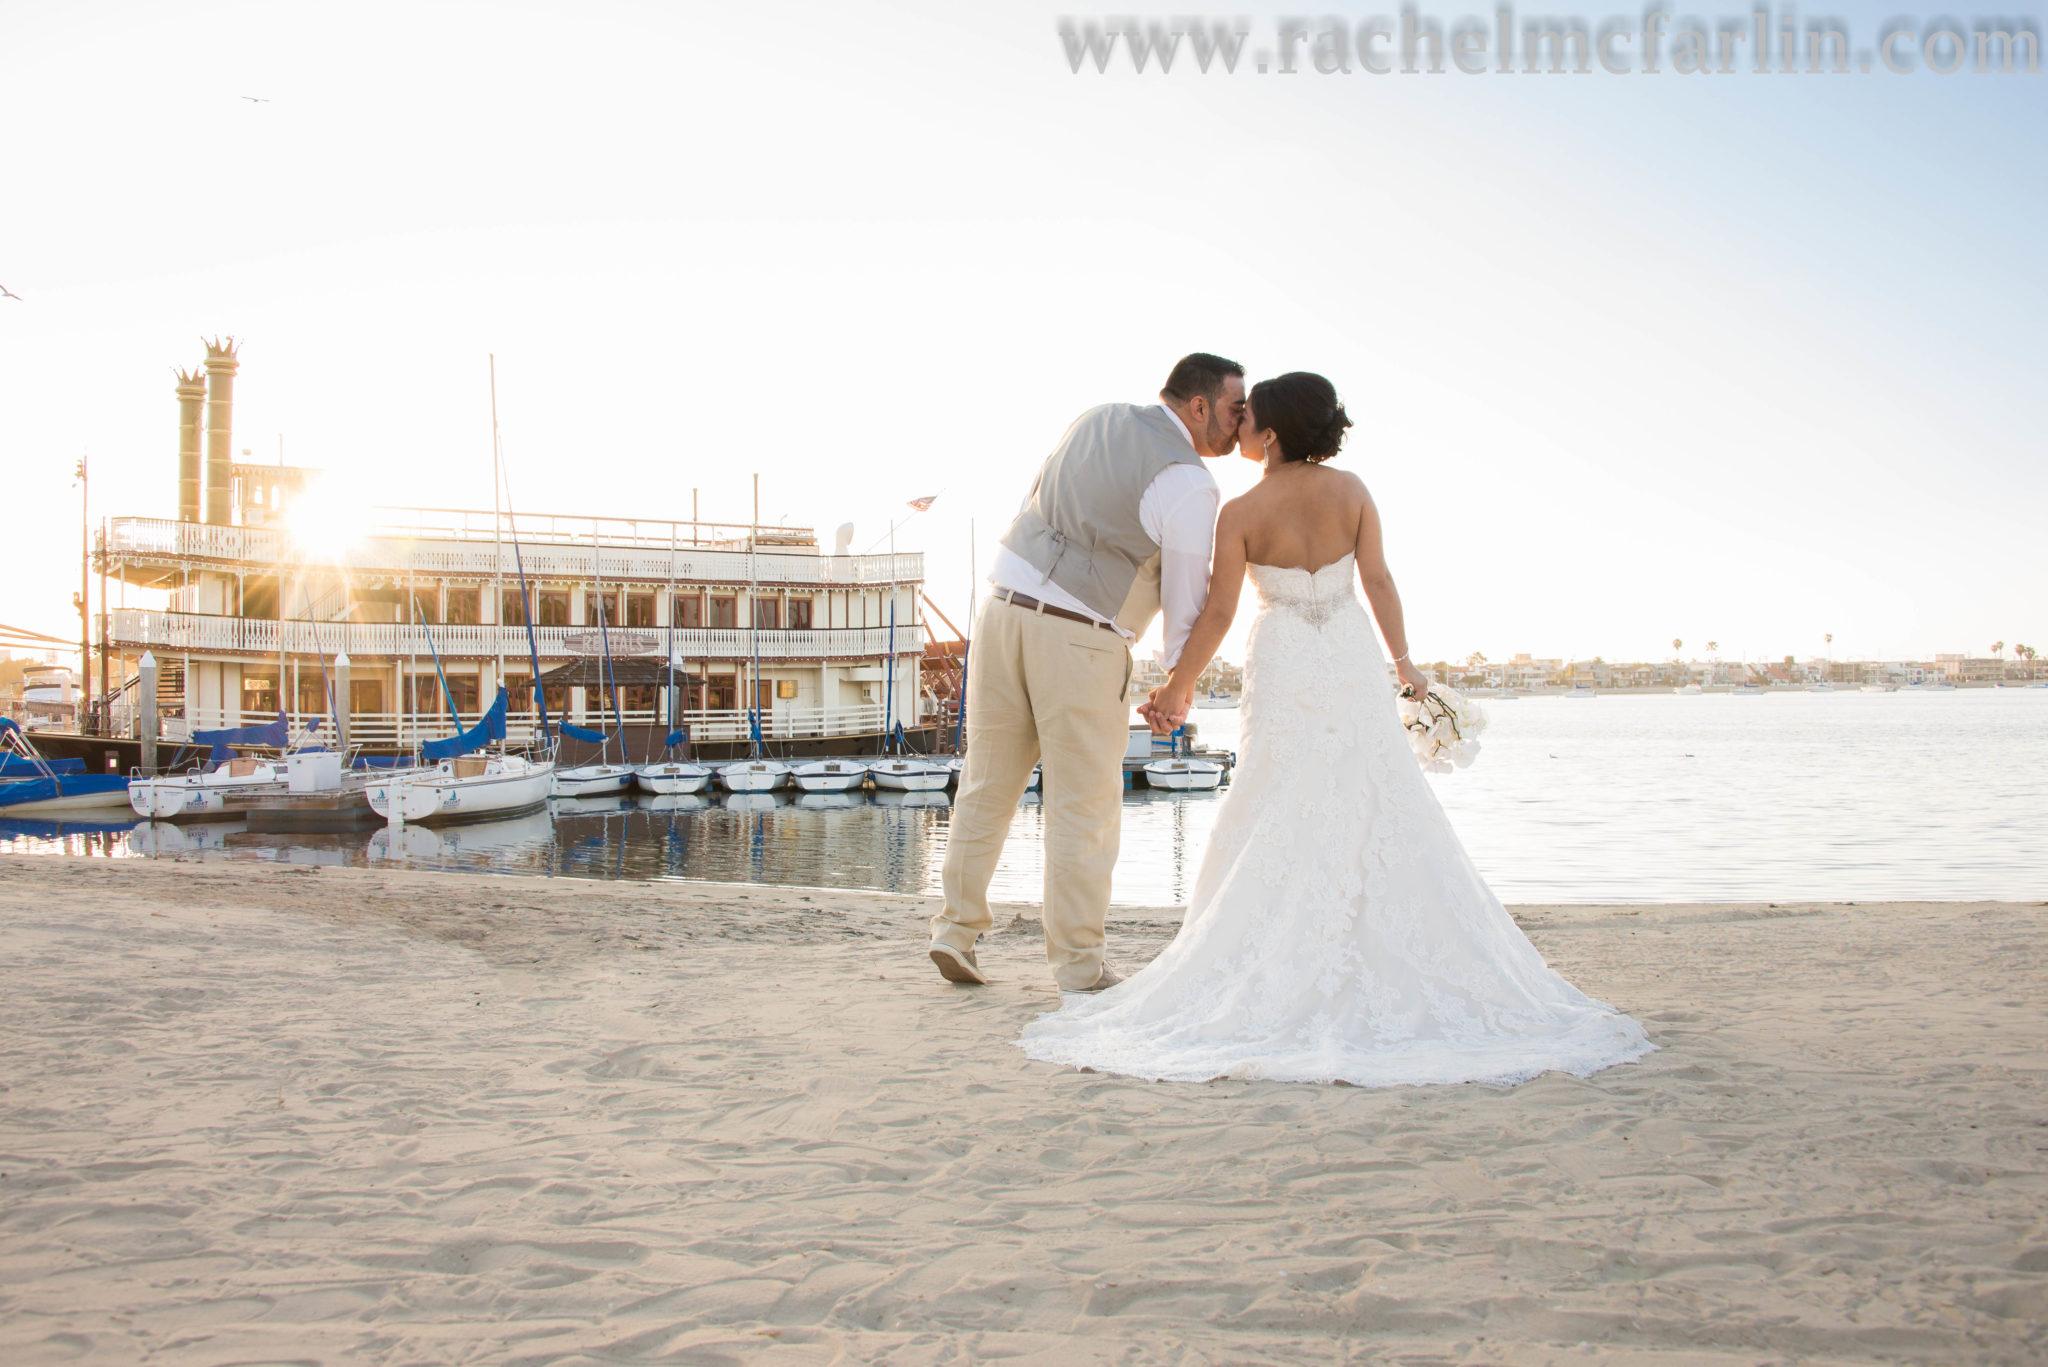 La Jolla Wedding Photographer, San Diego Destination Wedding Photographer